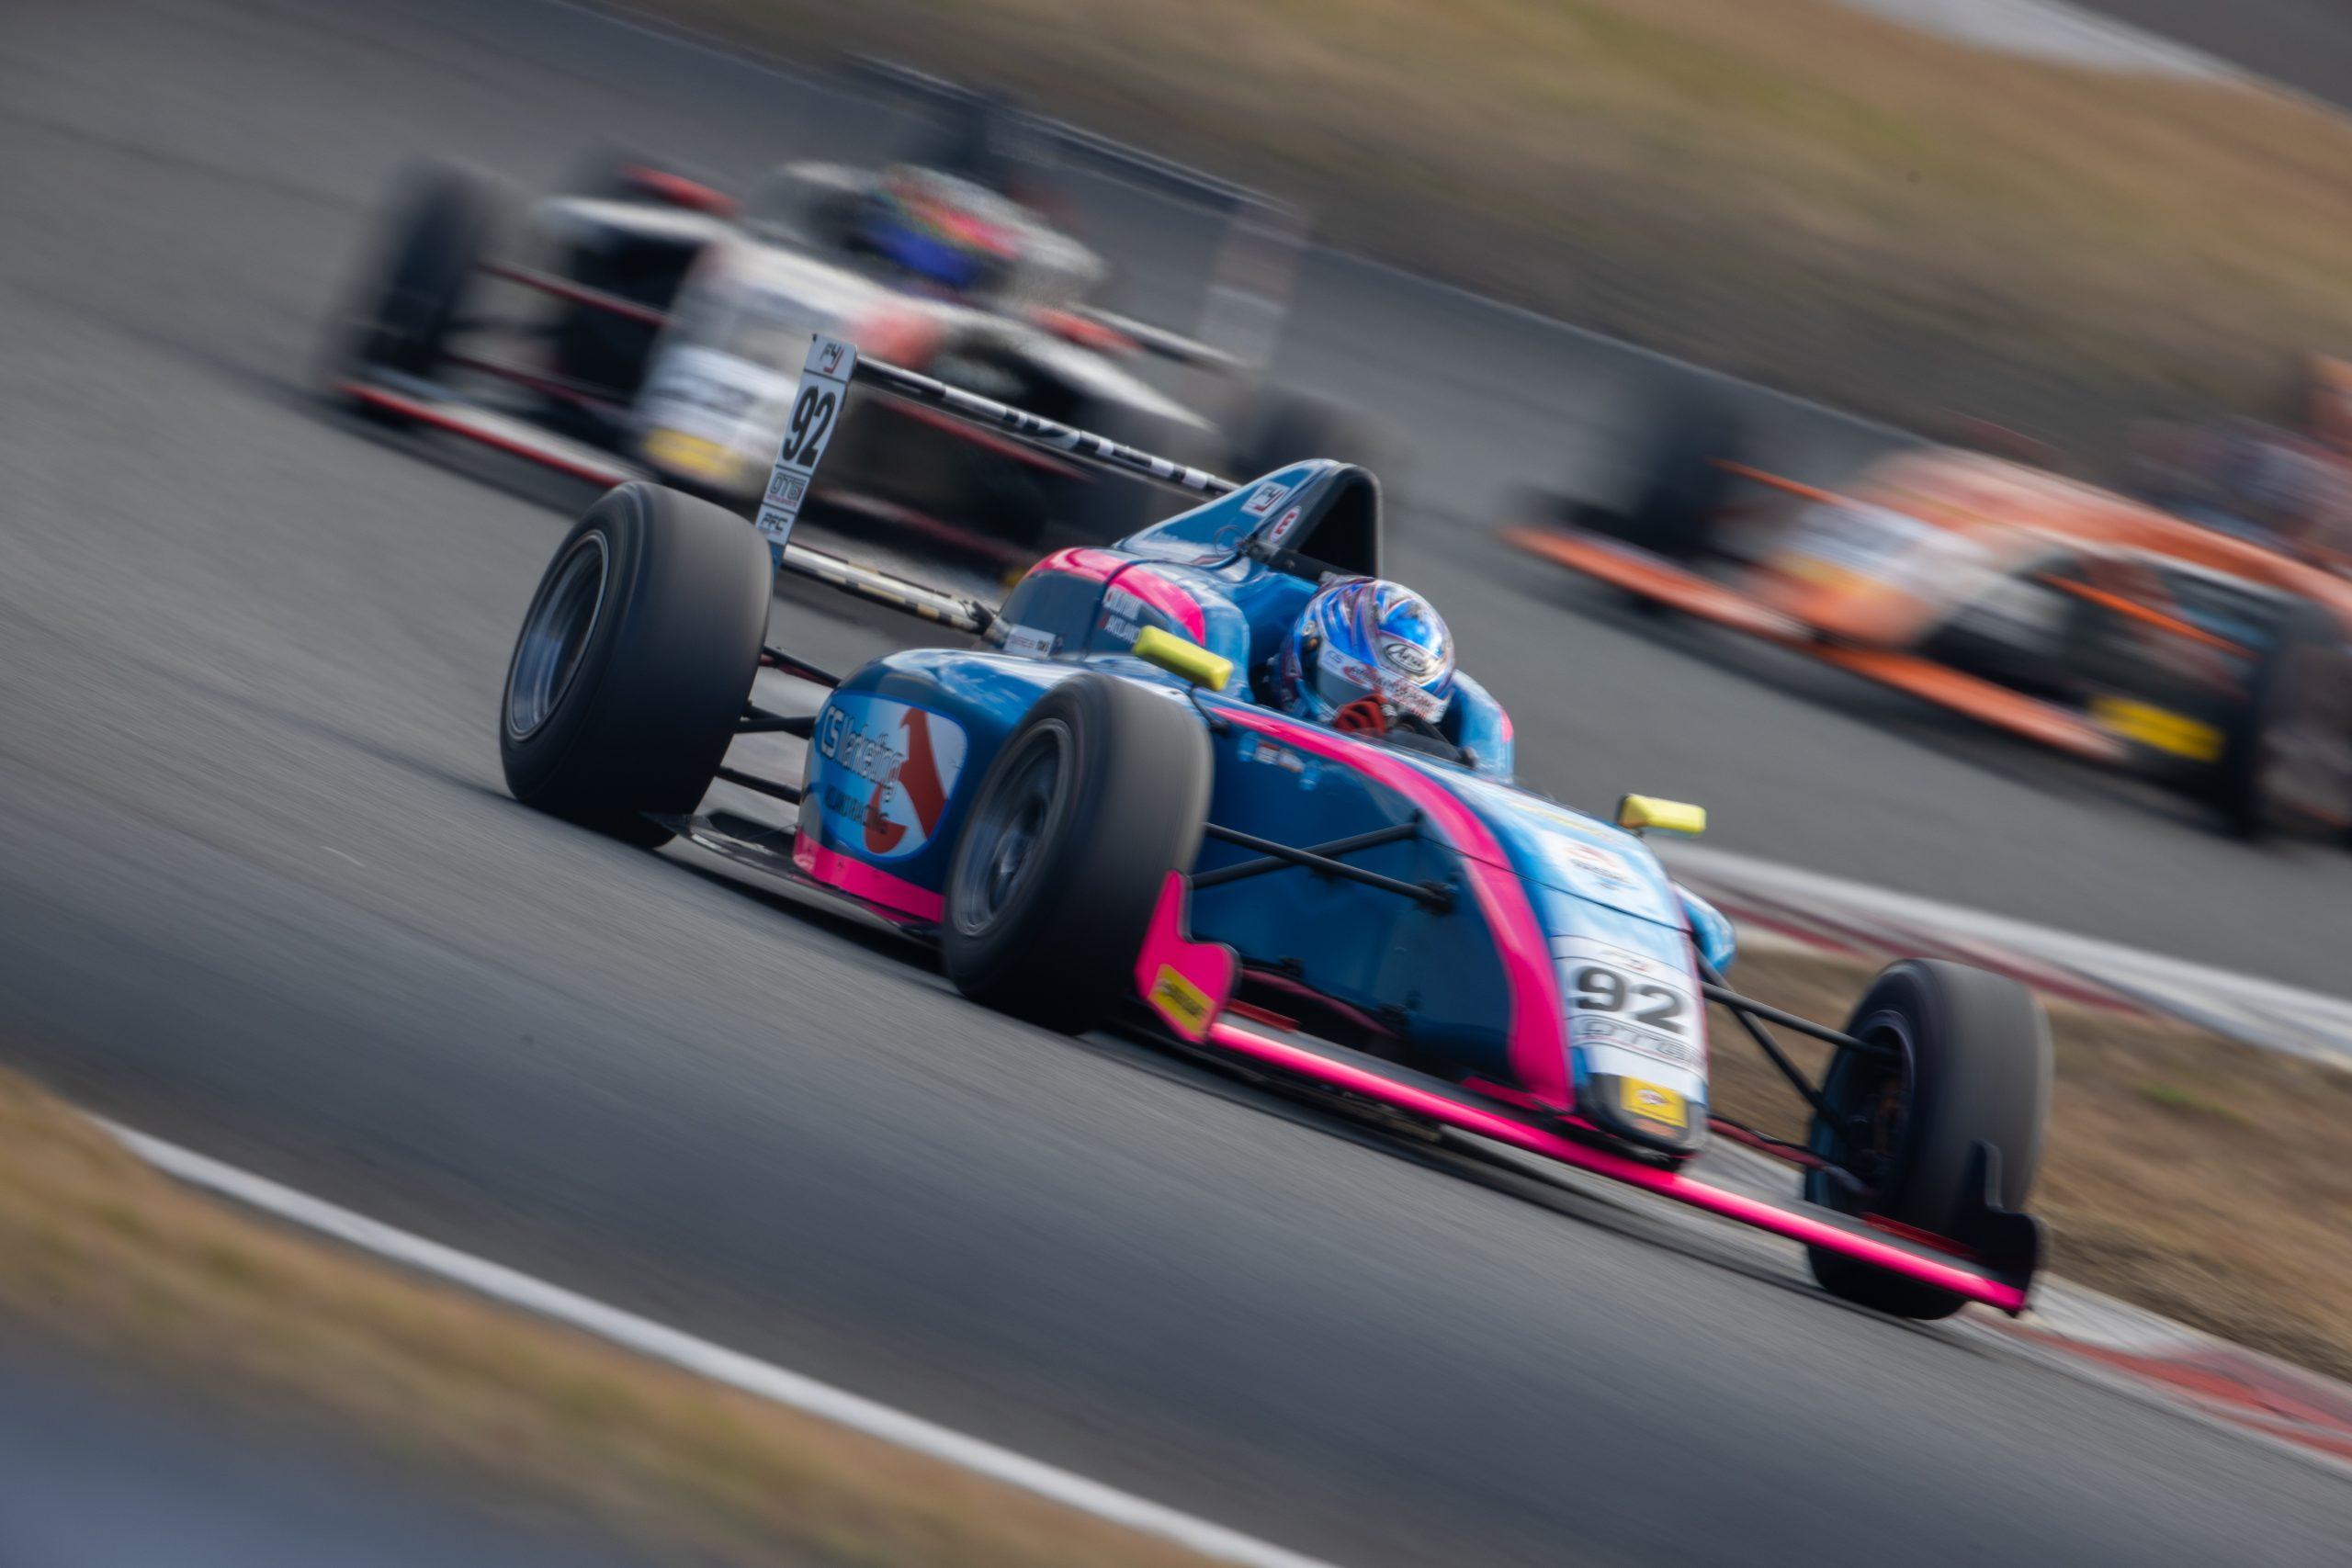 Motorsports photo #11 【EOS-1D X Mark III】